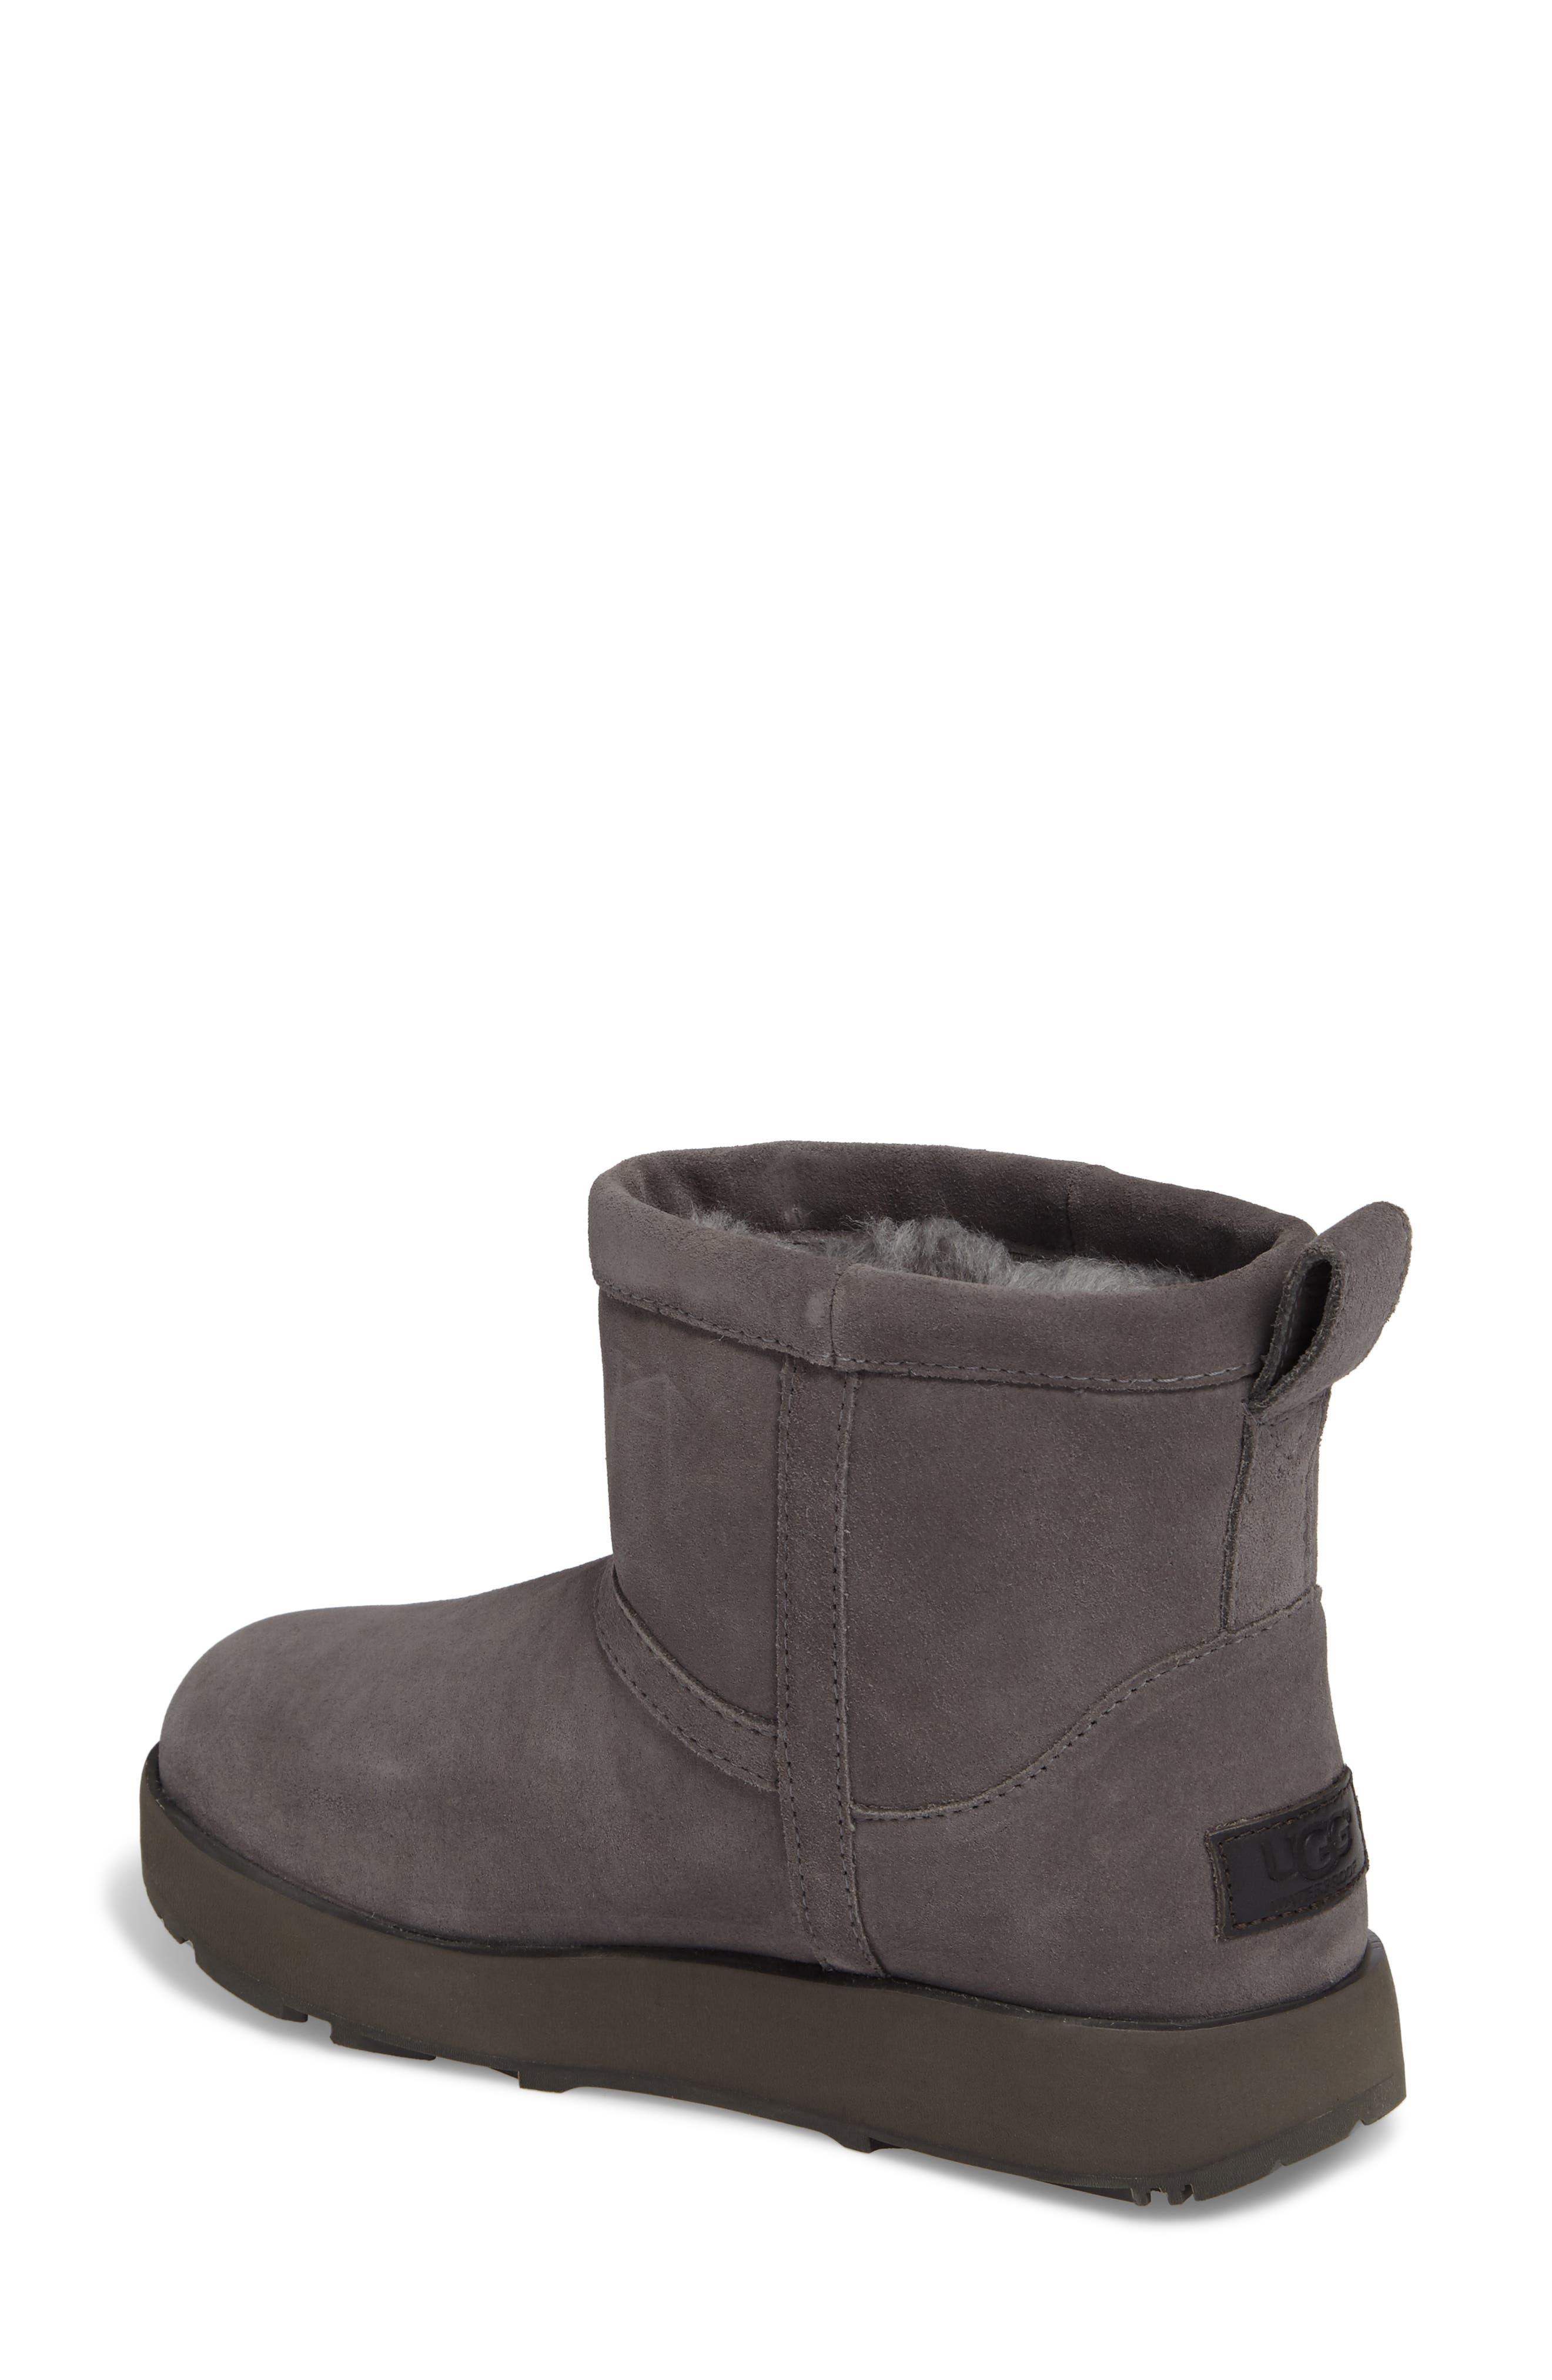 Alternate Image 2  - UGG® Classic Mini Waterproof Boot (Women)